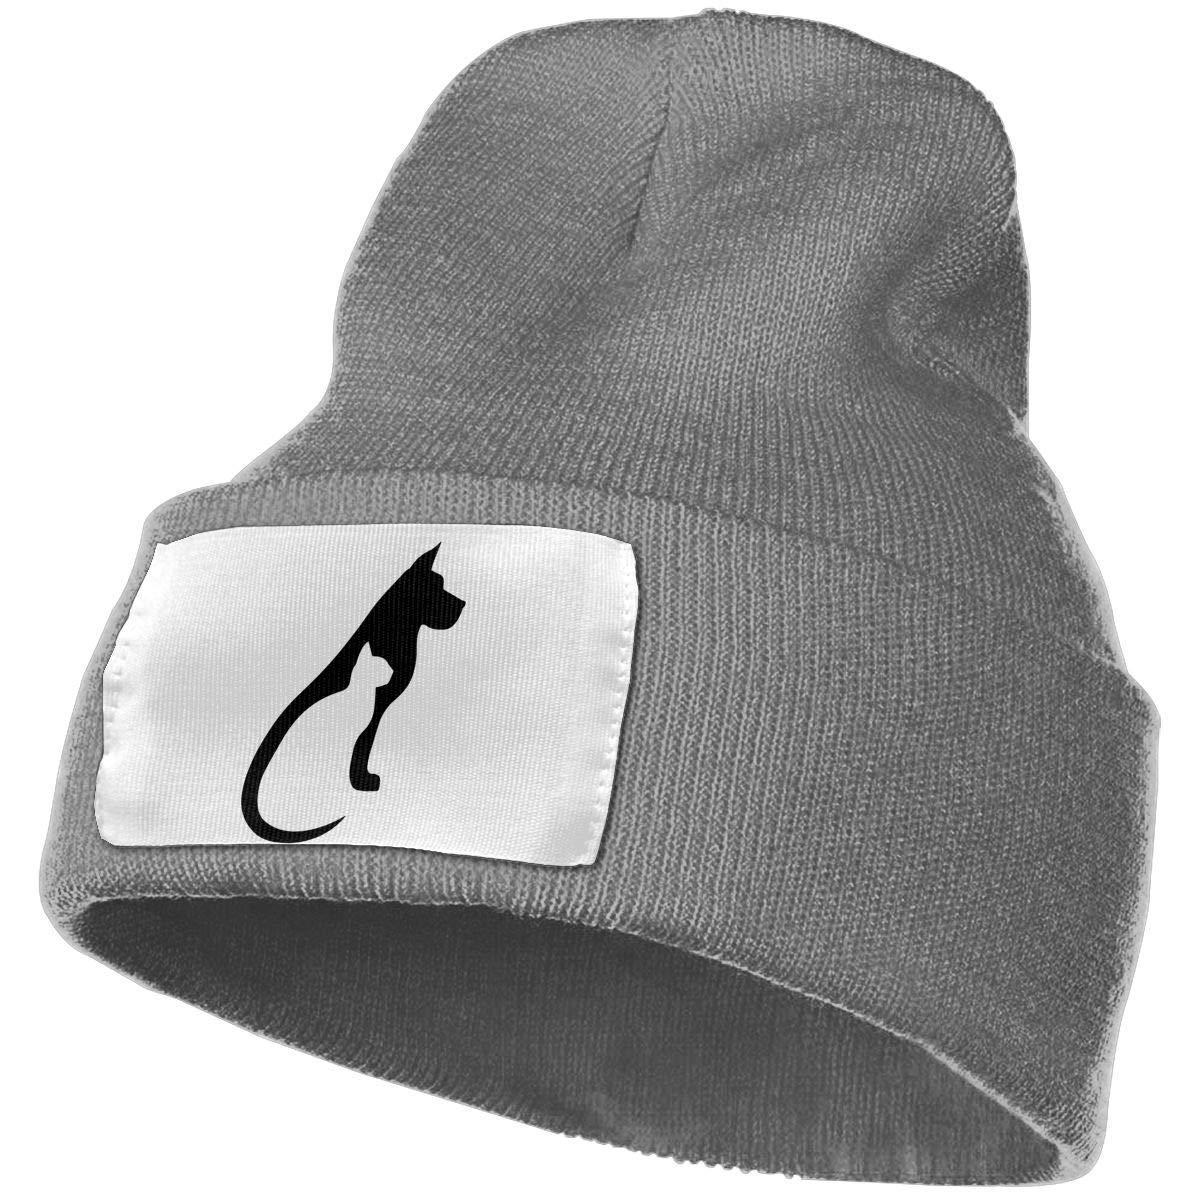 Mens Womens 100/% Acrylic Knit Hat Cap Cat and Dog Warm Ski Cap